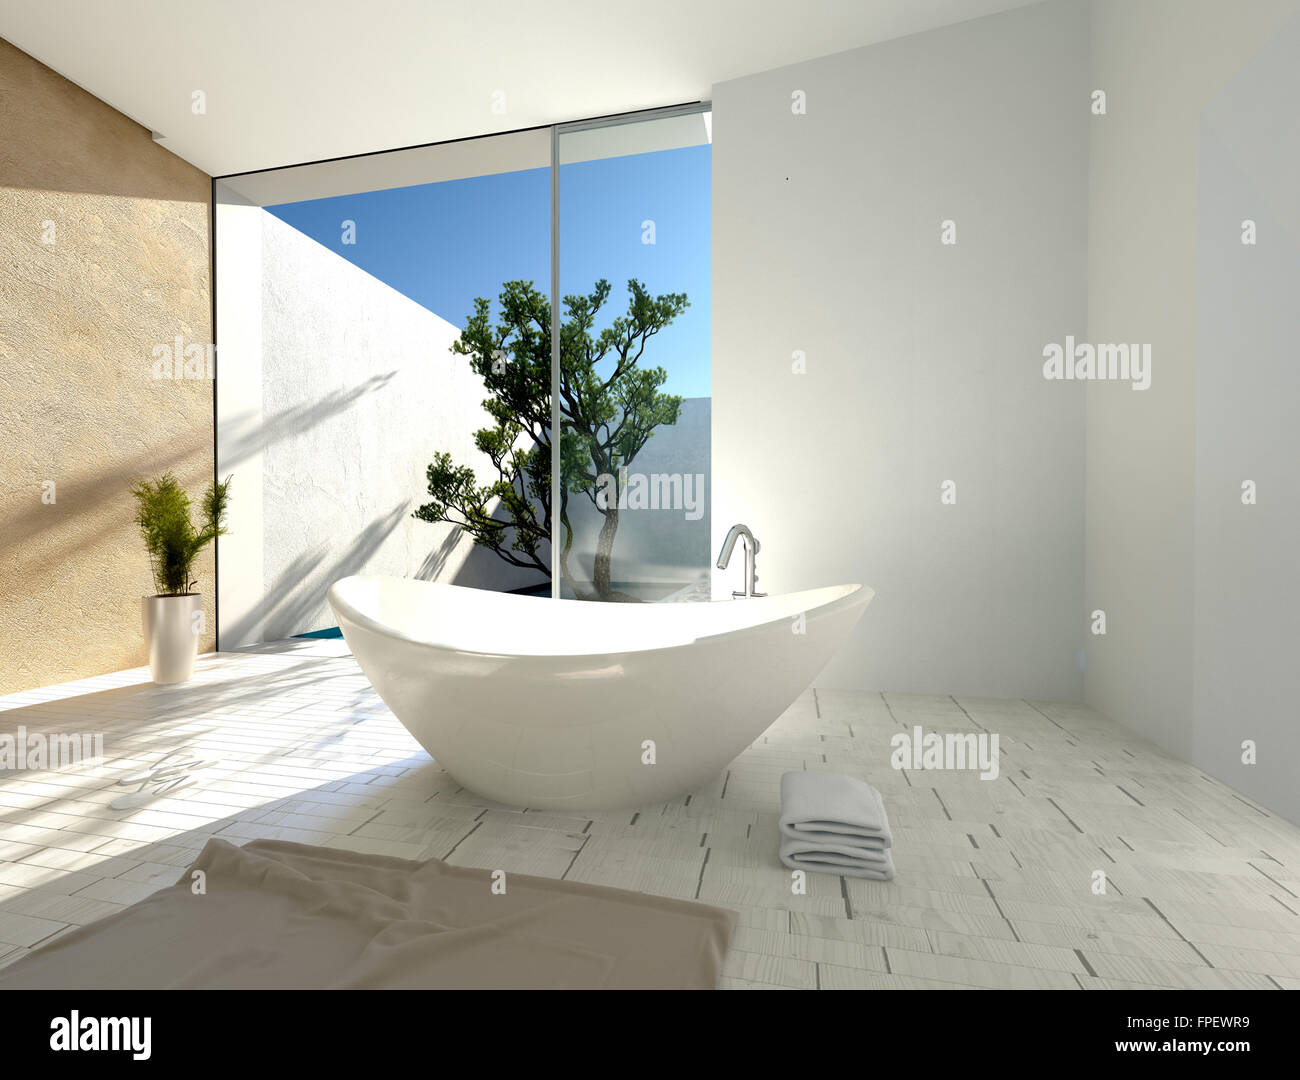 Vasca Da Bagno Vetro : Elegante e moderna imbarcazione a forma di vasca da bagno in una